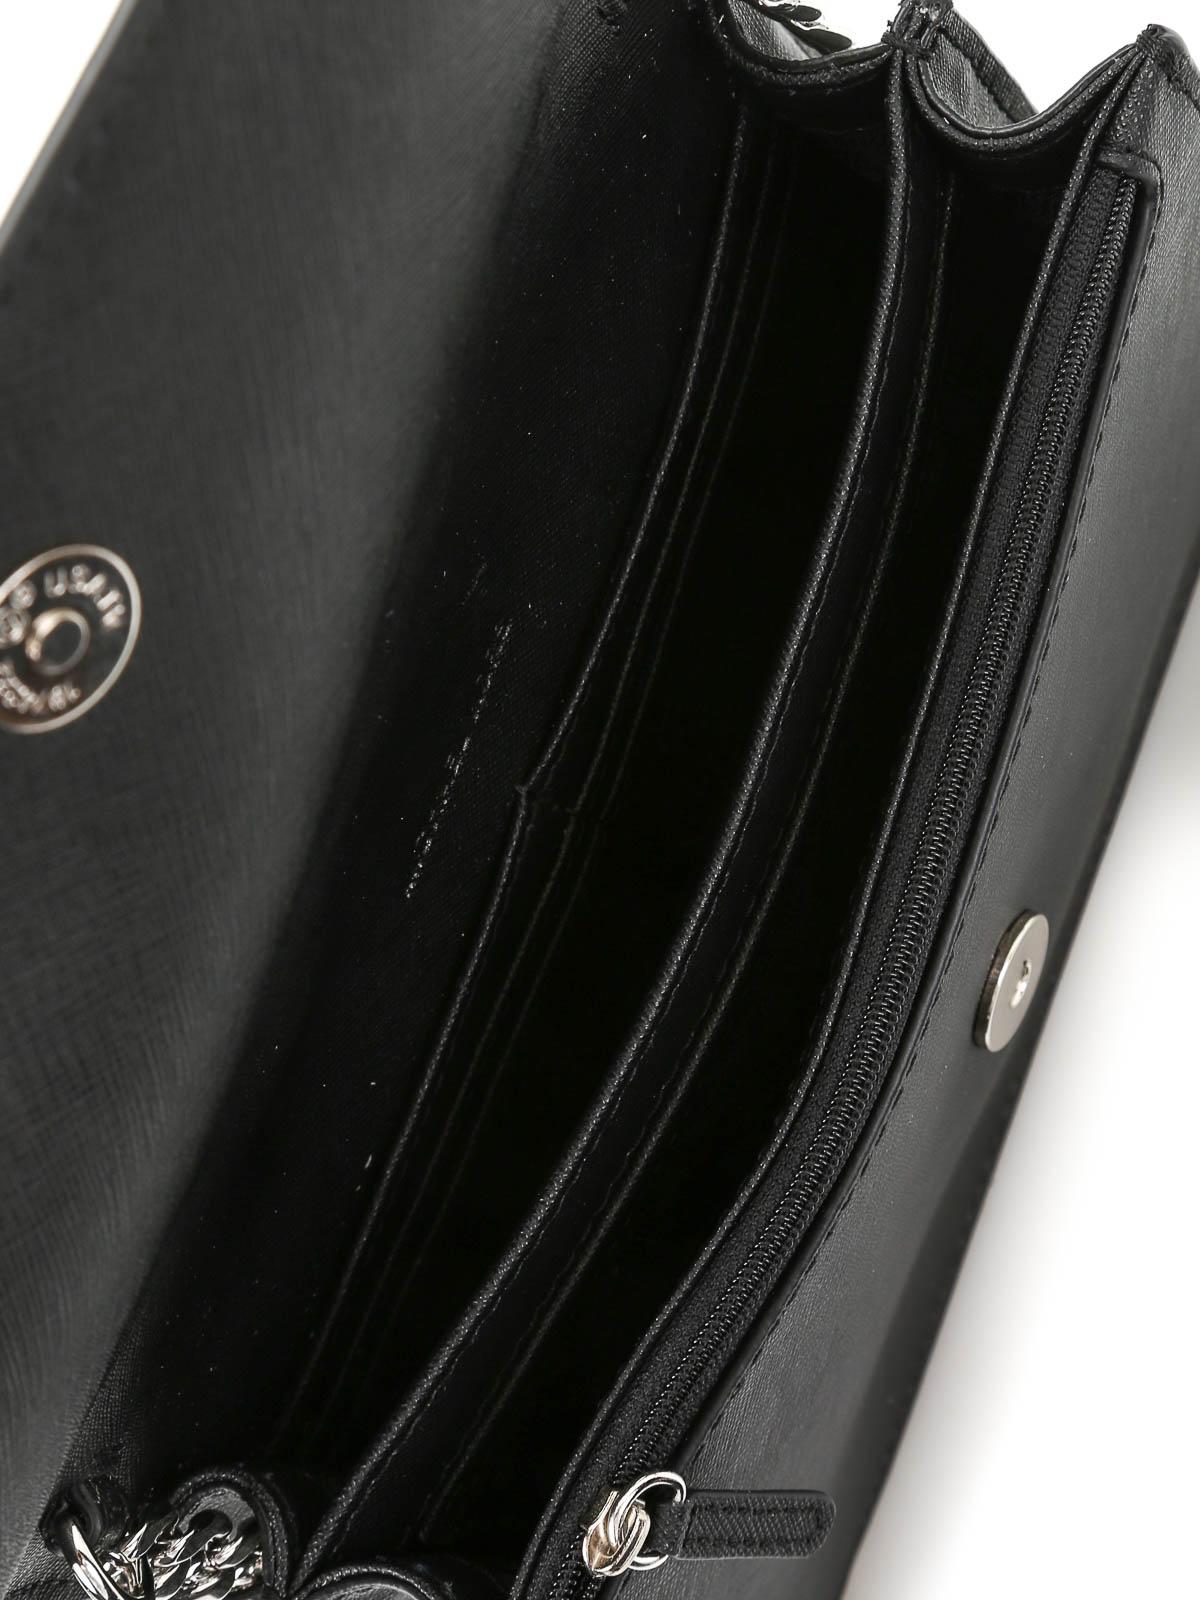 6a2f537d44df65 MICHAEL KORS buy online Daniela small crossbody. MICHAEL KORS: cross body  bags ...